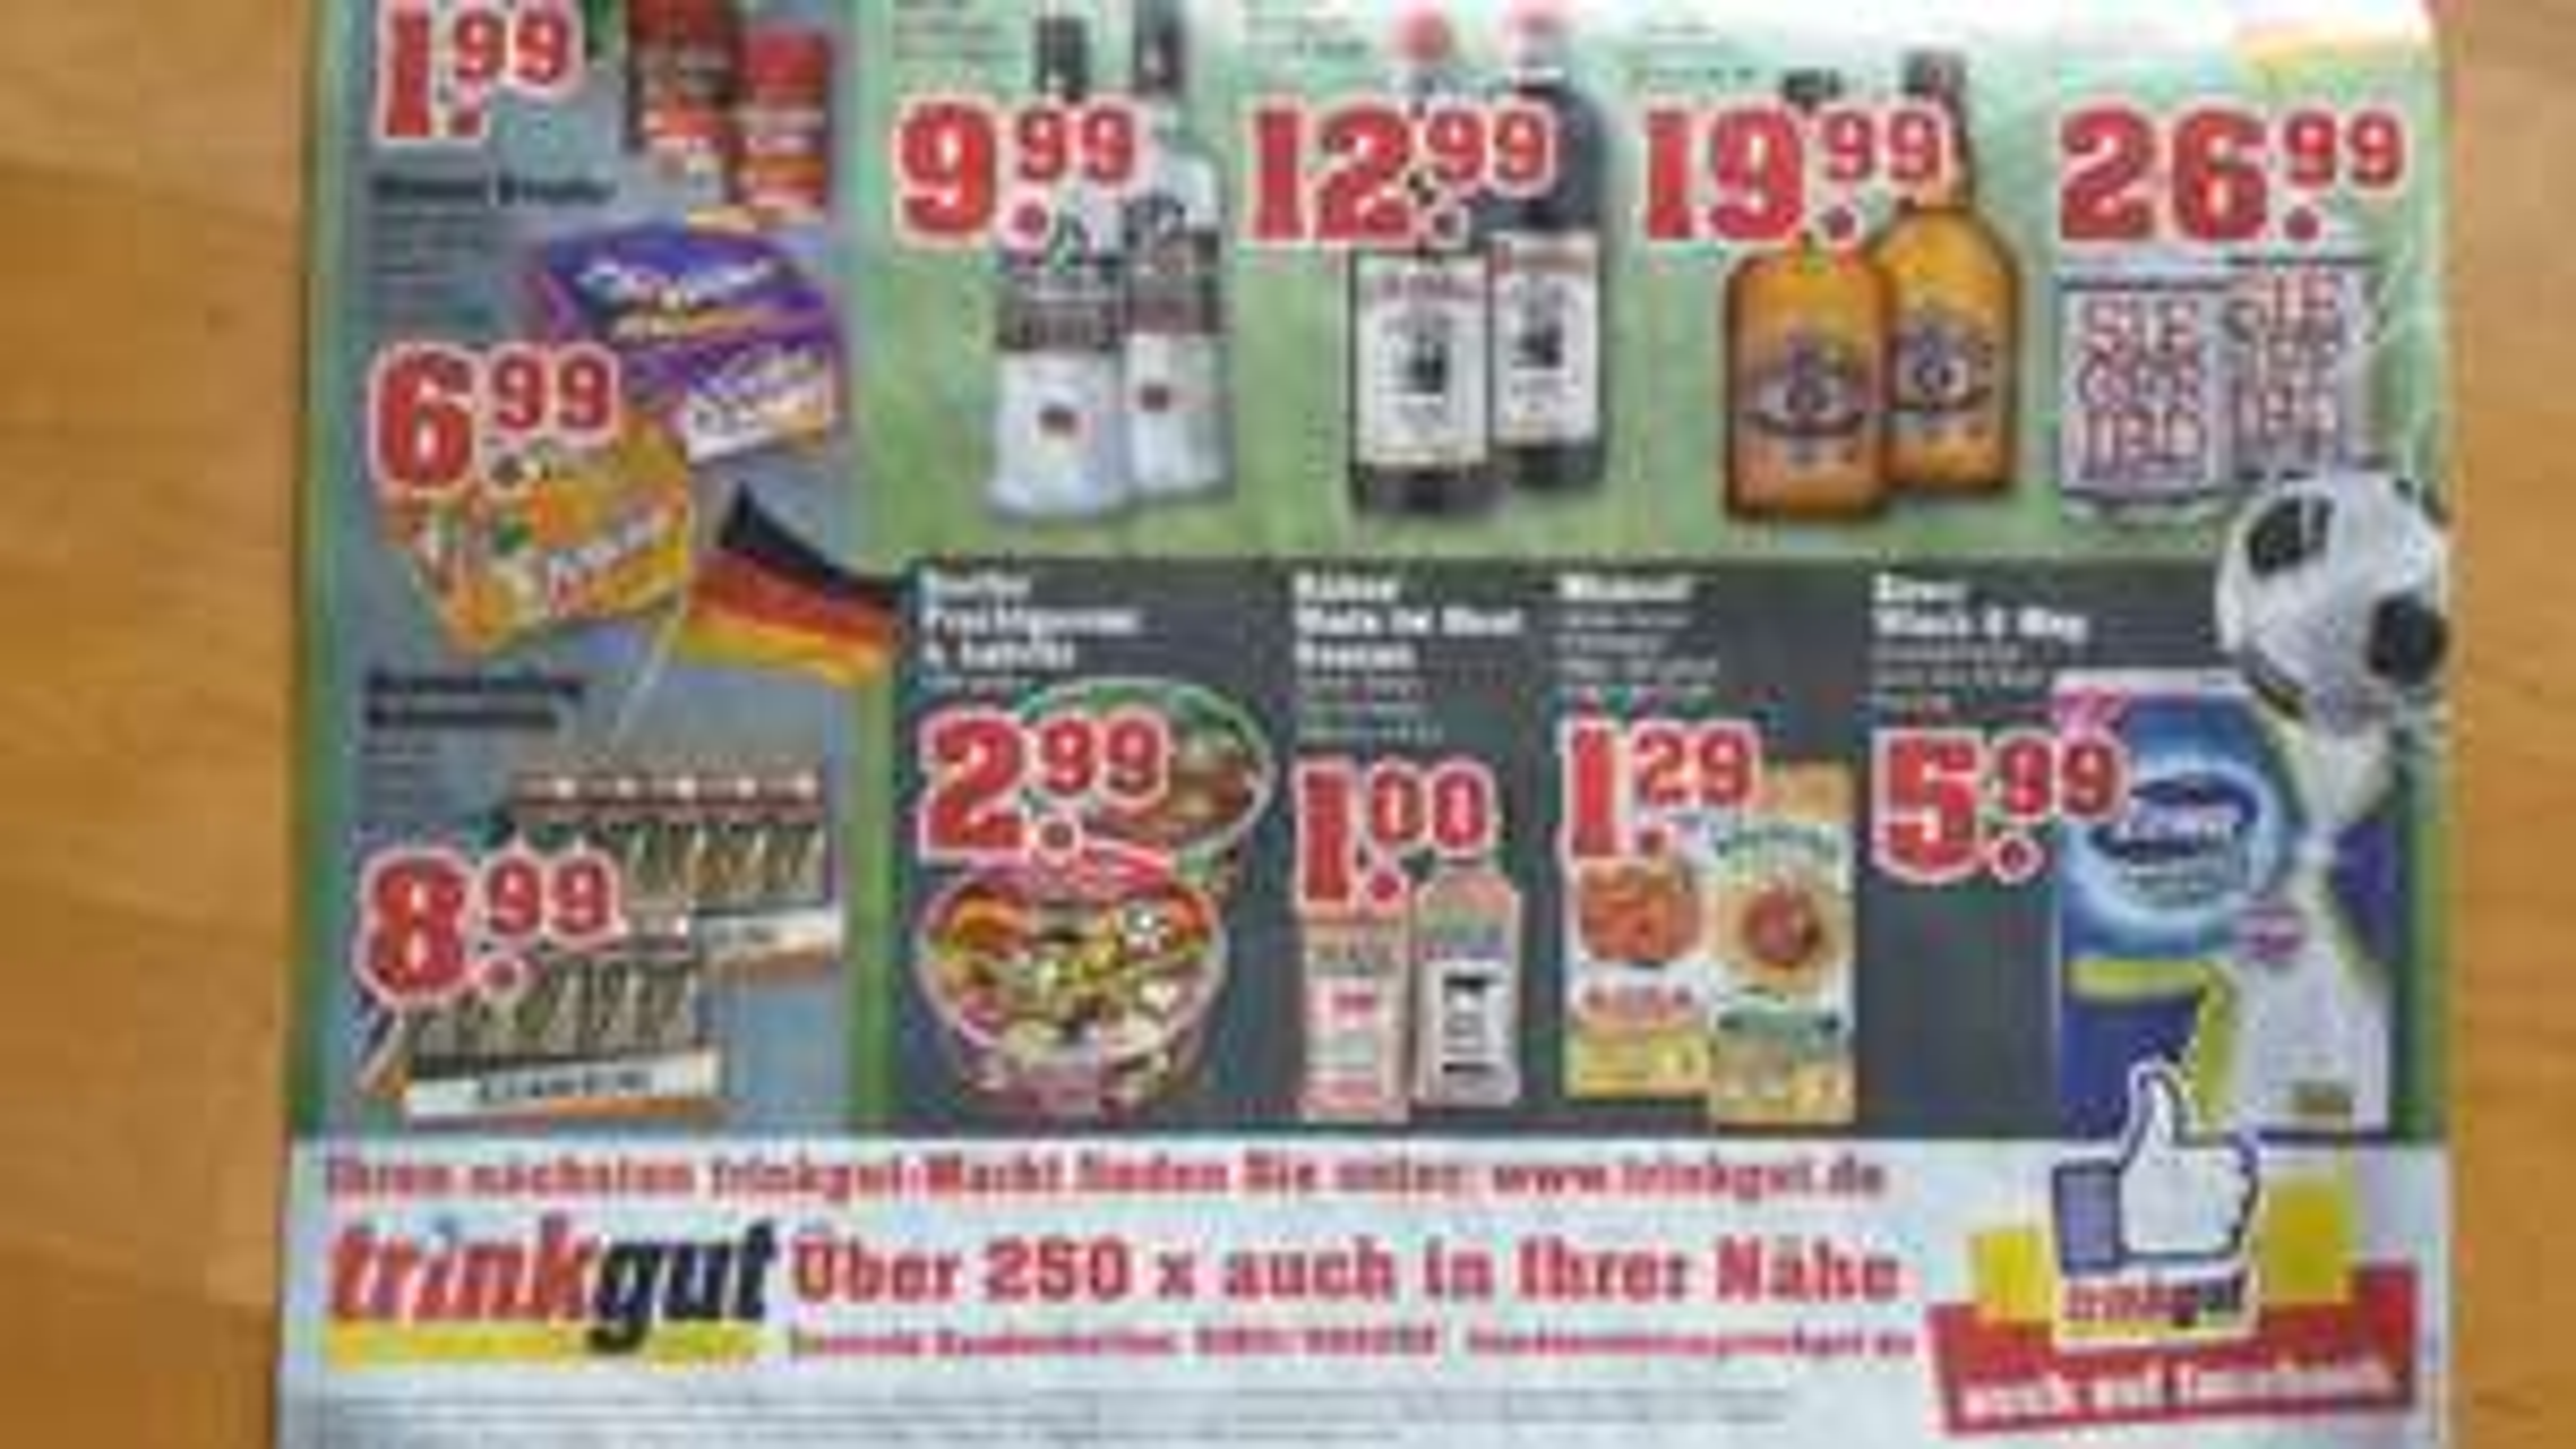 Rösle Gasgrill Trink Gut : Trinkgut angebote deals ⇒ oktober mydealz